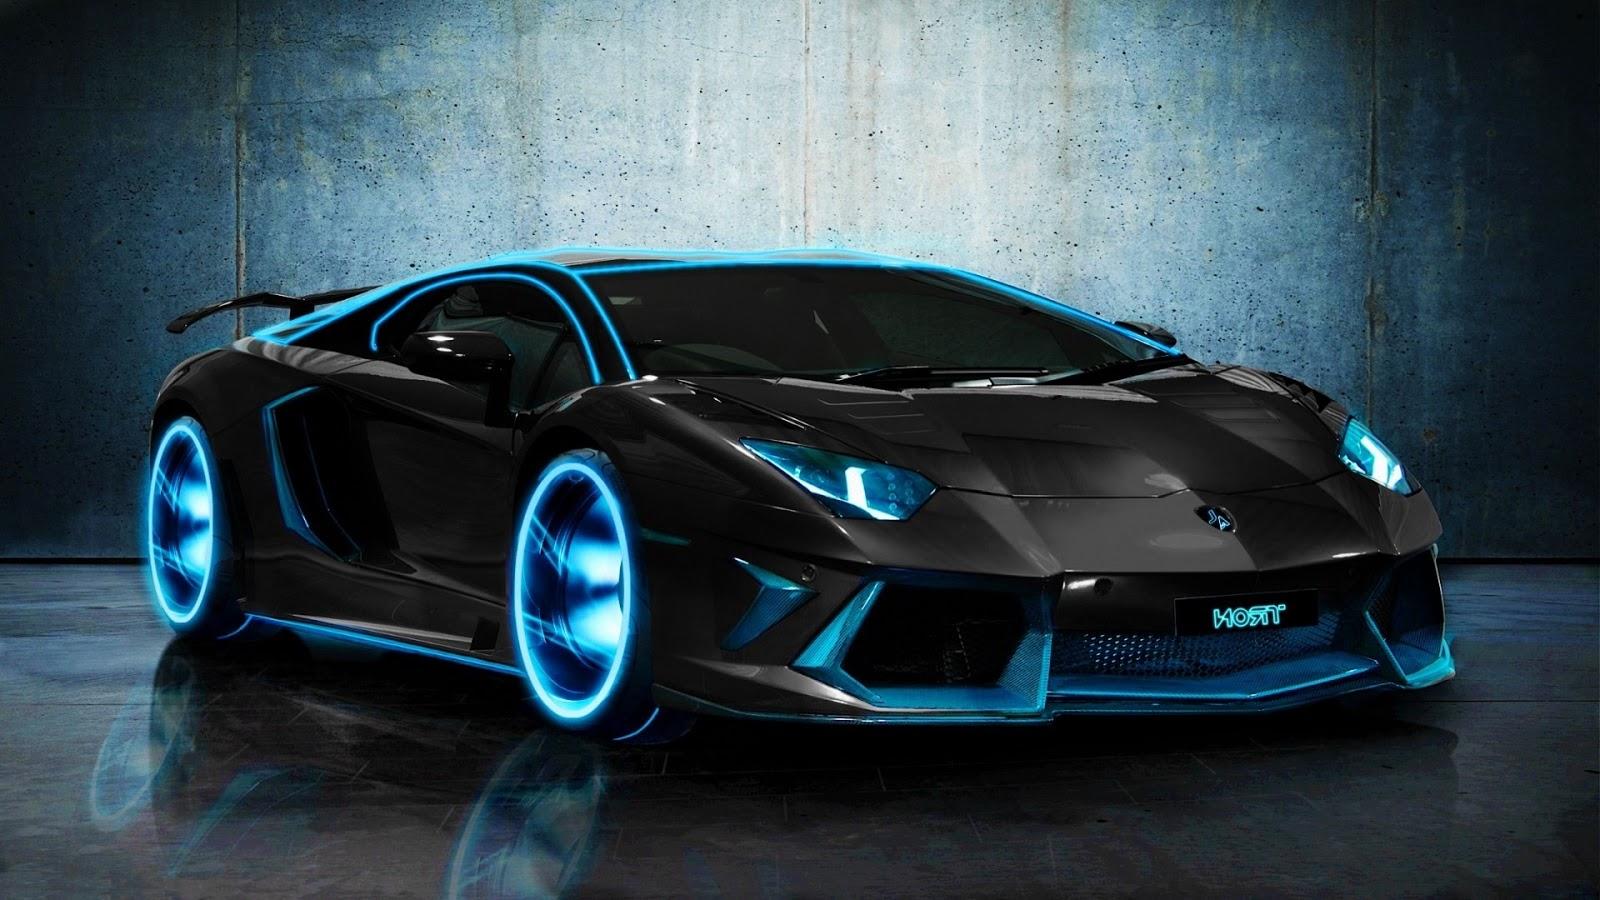 Blue Lamborghini Car Pictures HD